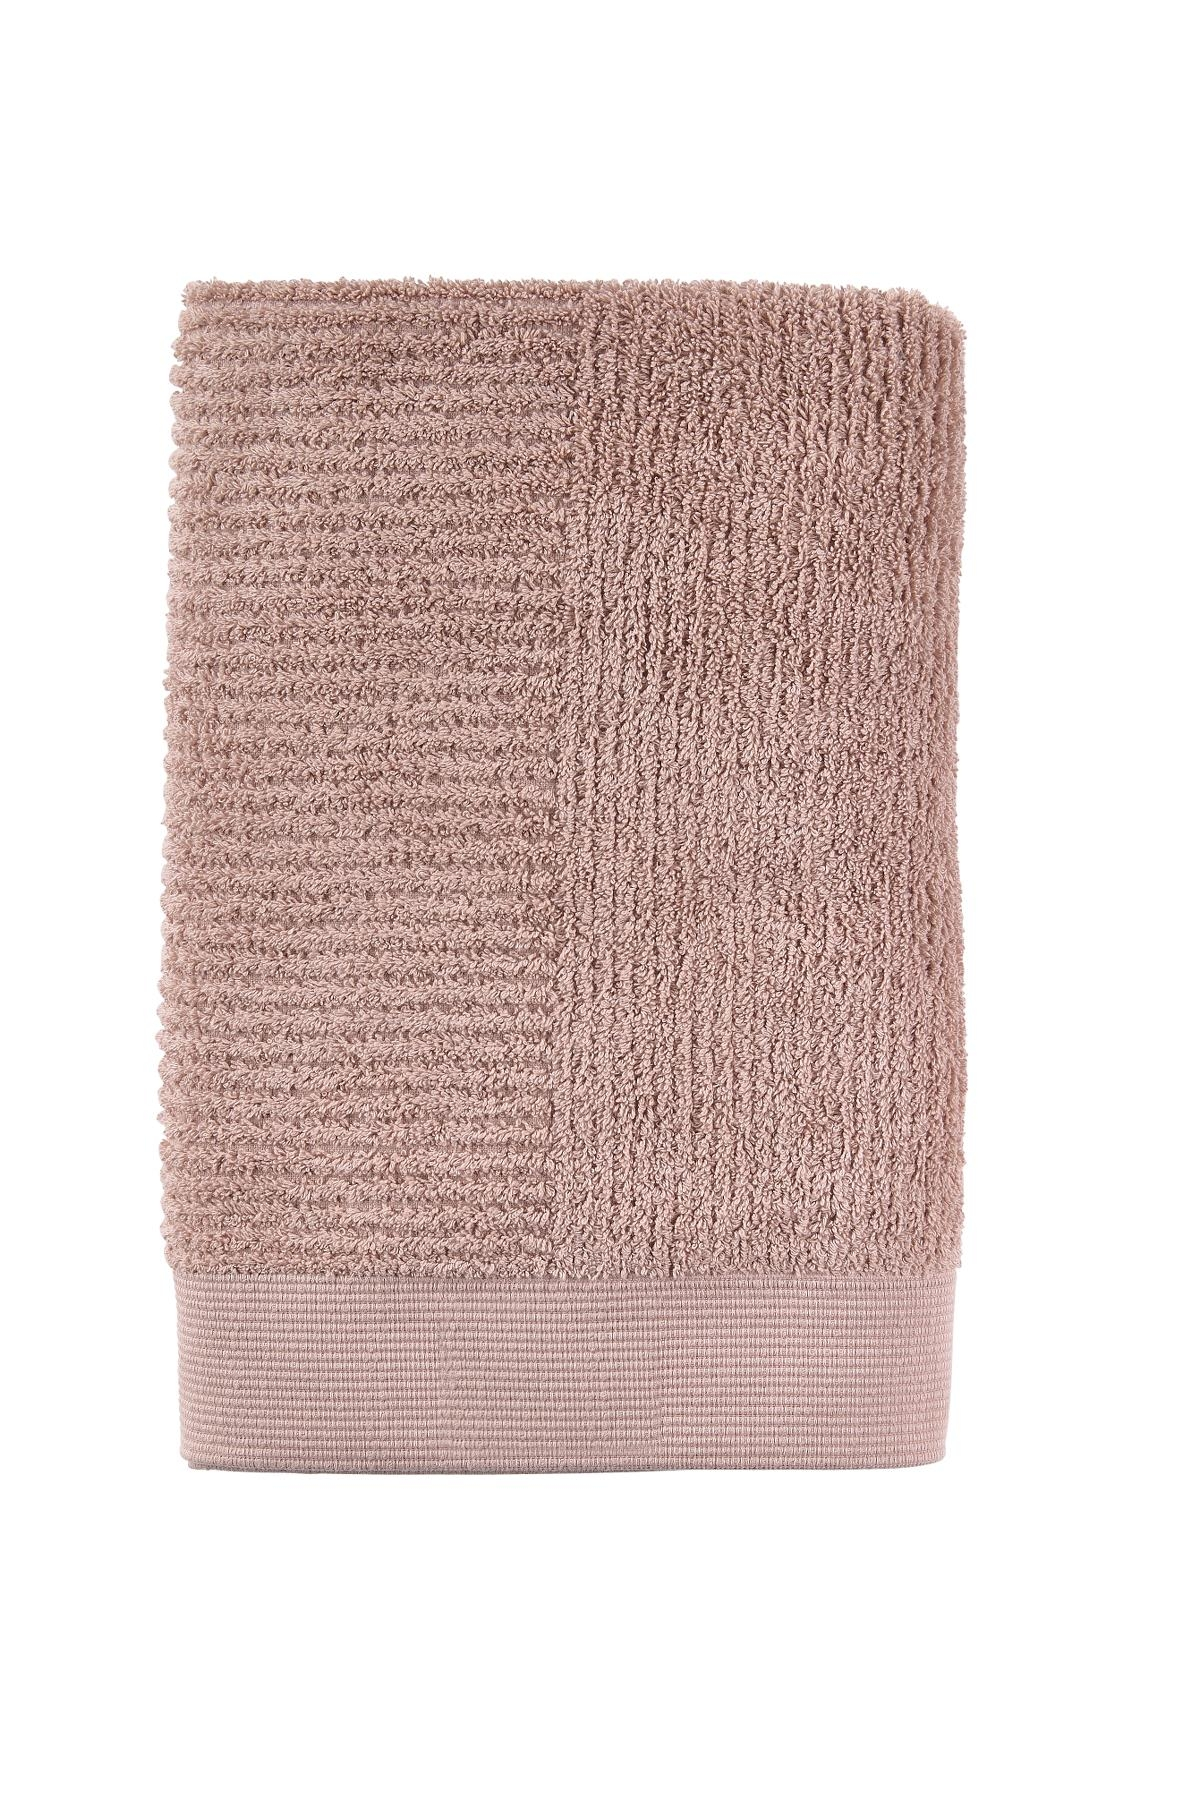 Zone Classic  håndklæde 70 x 140 Nude